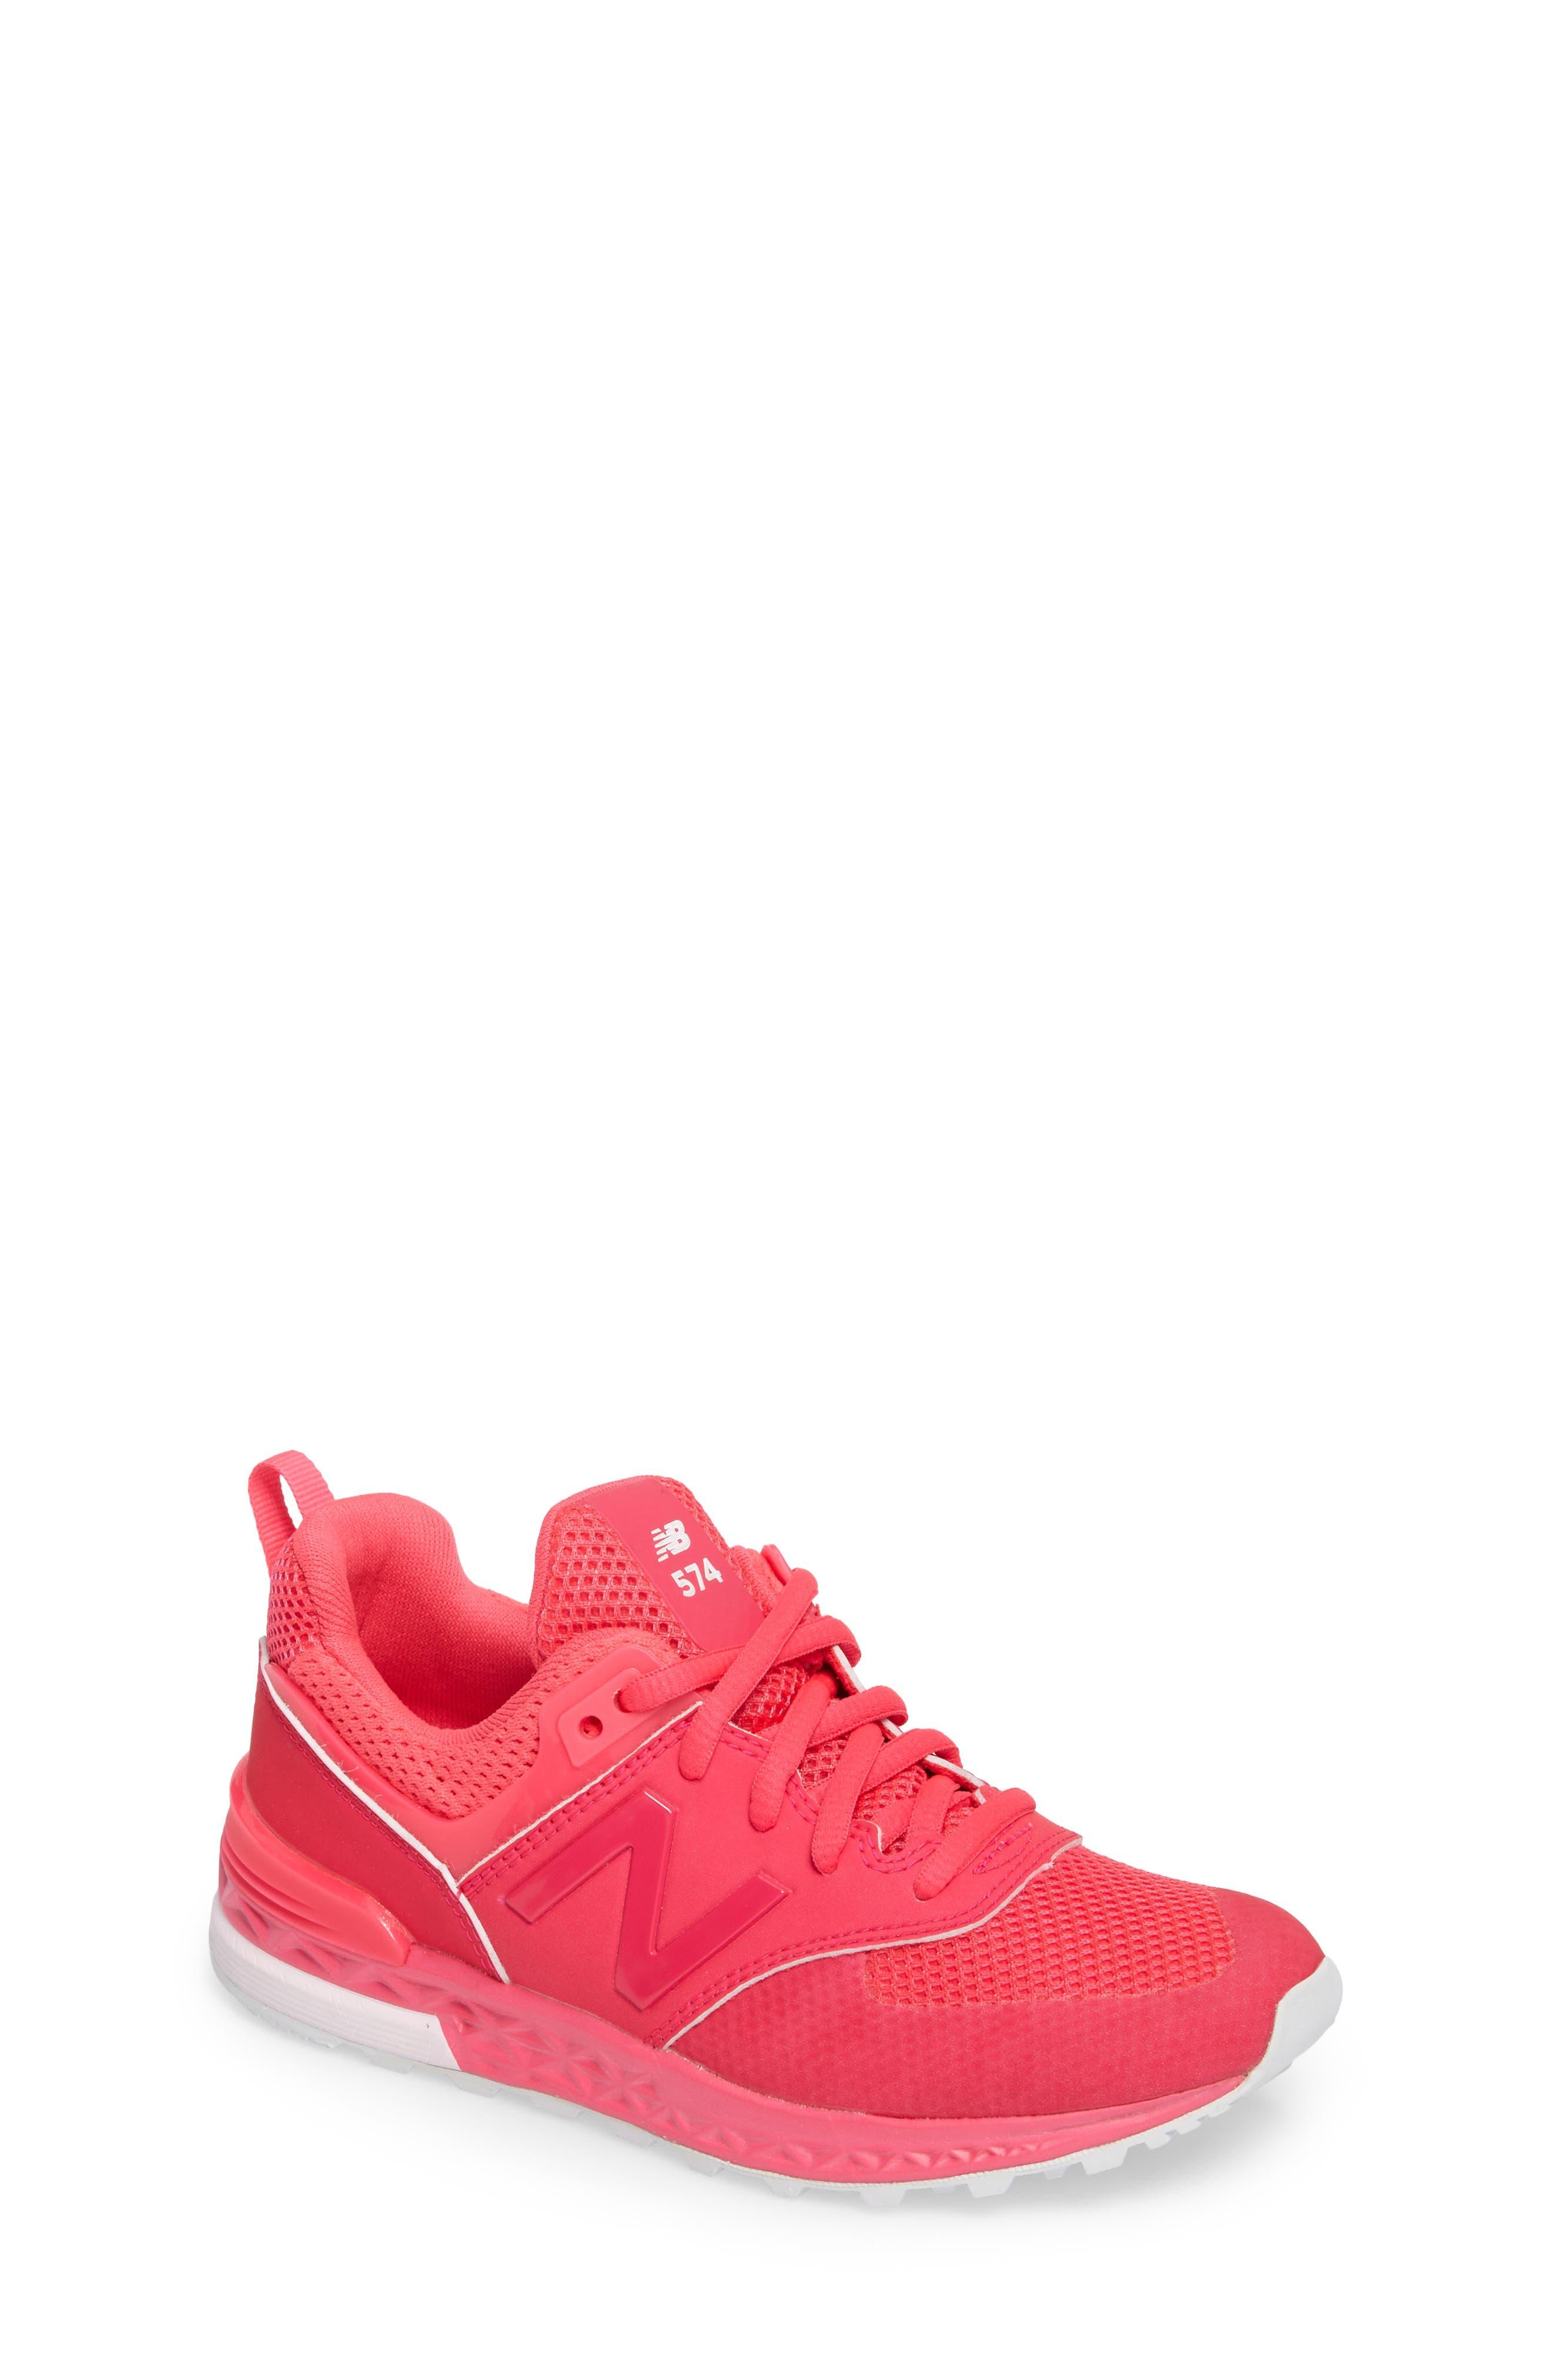 574 v2 Sport Sneaker,                         Main,                         color, 660